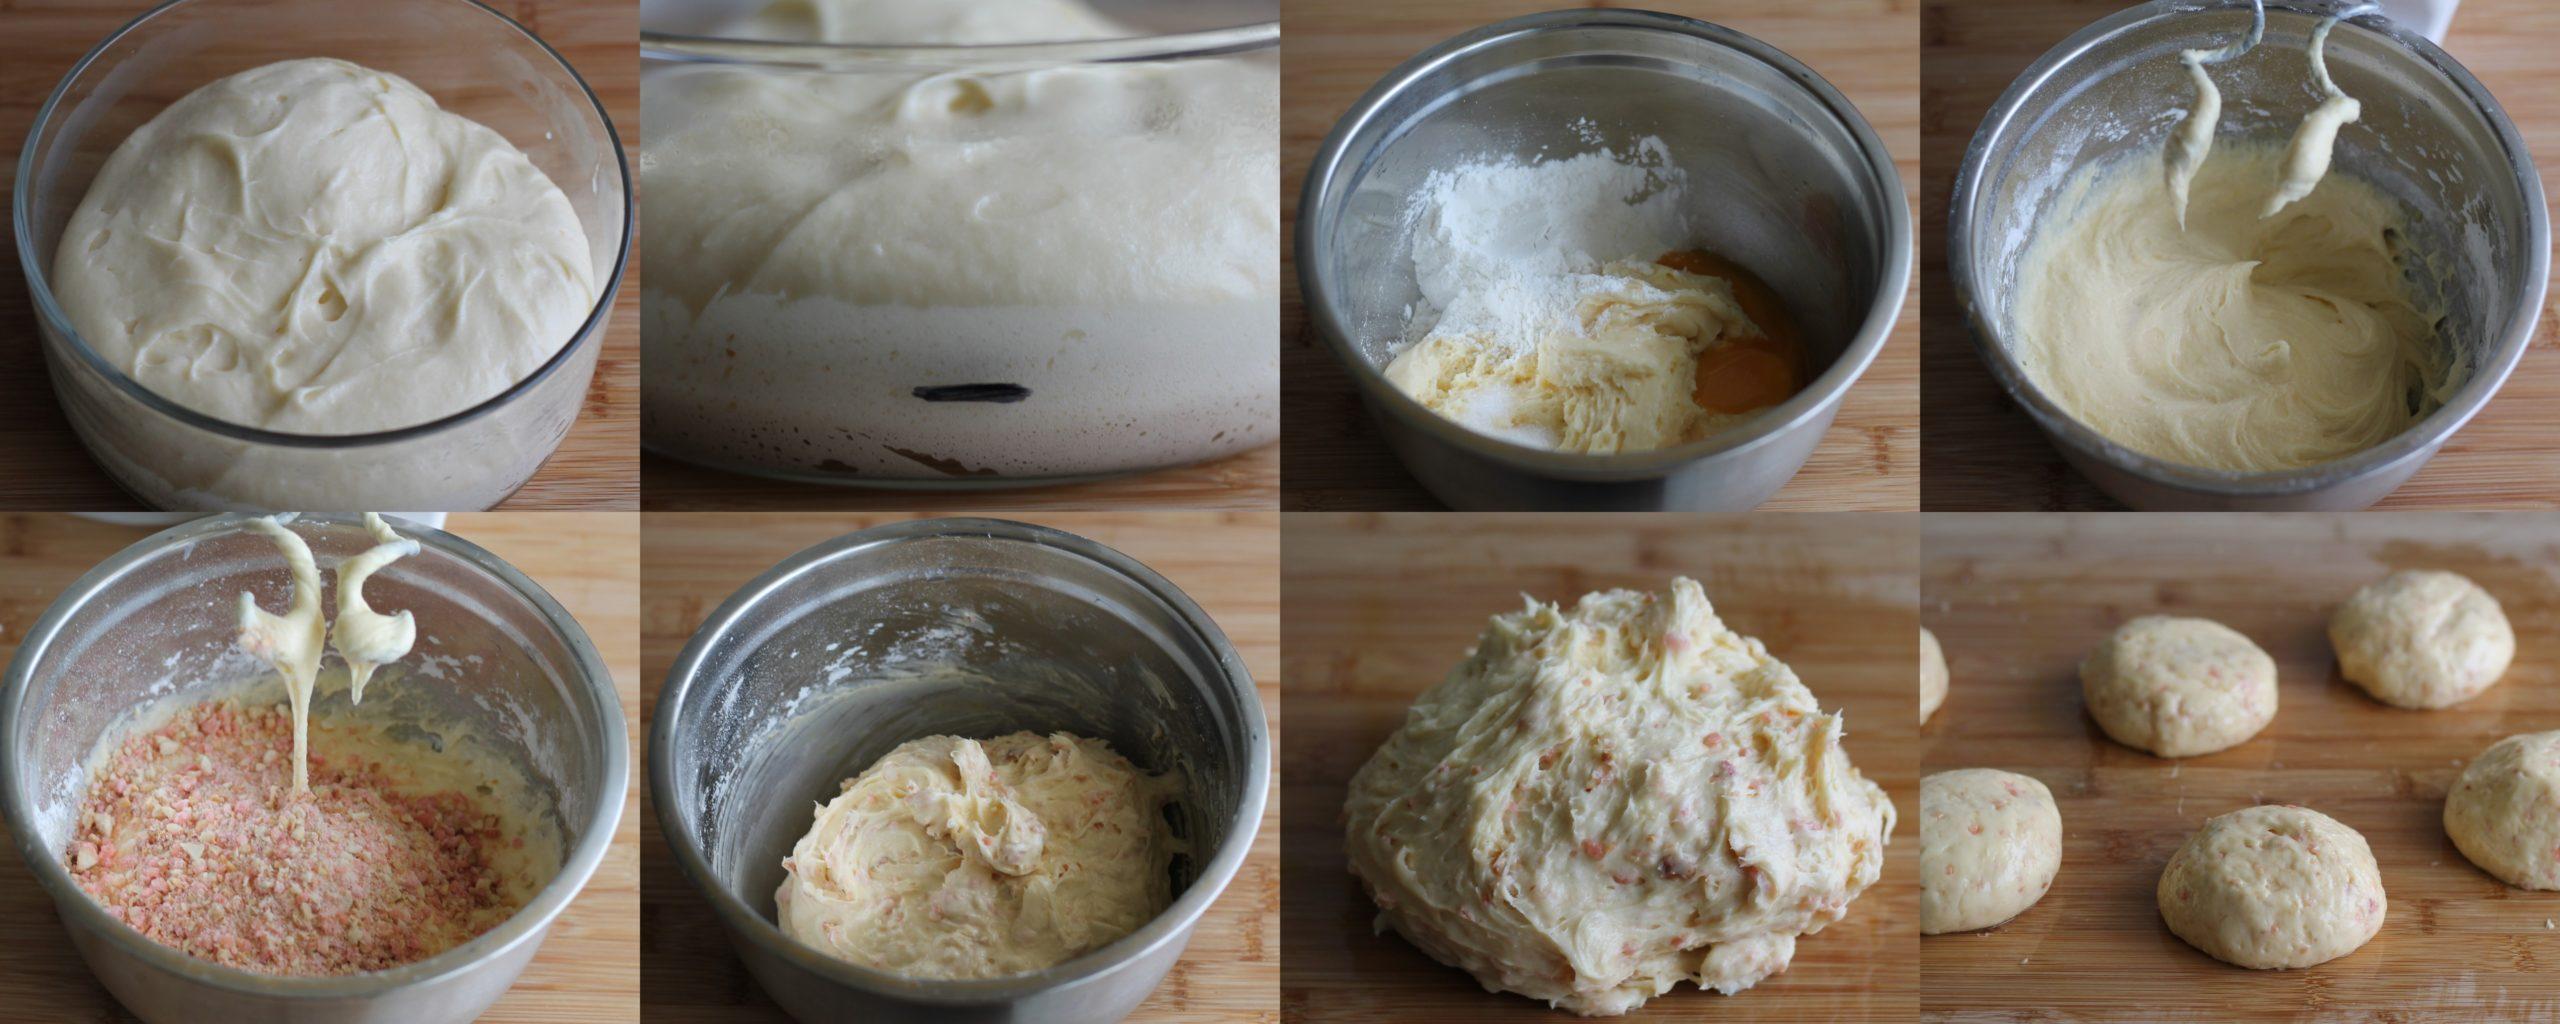 Panettoncini senza glutine alle praline rosa - La Cassata Celiaca